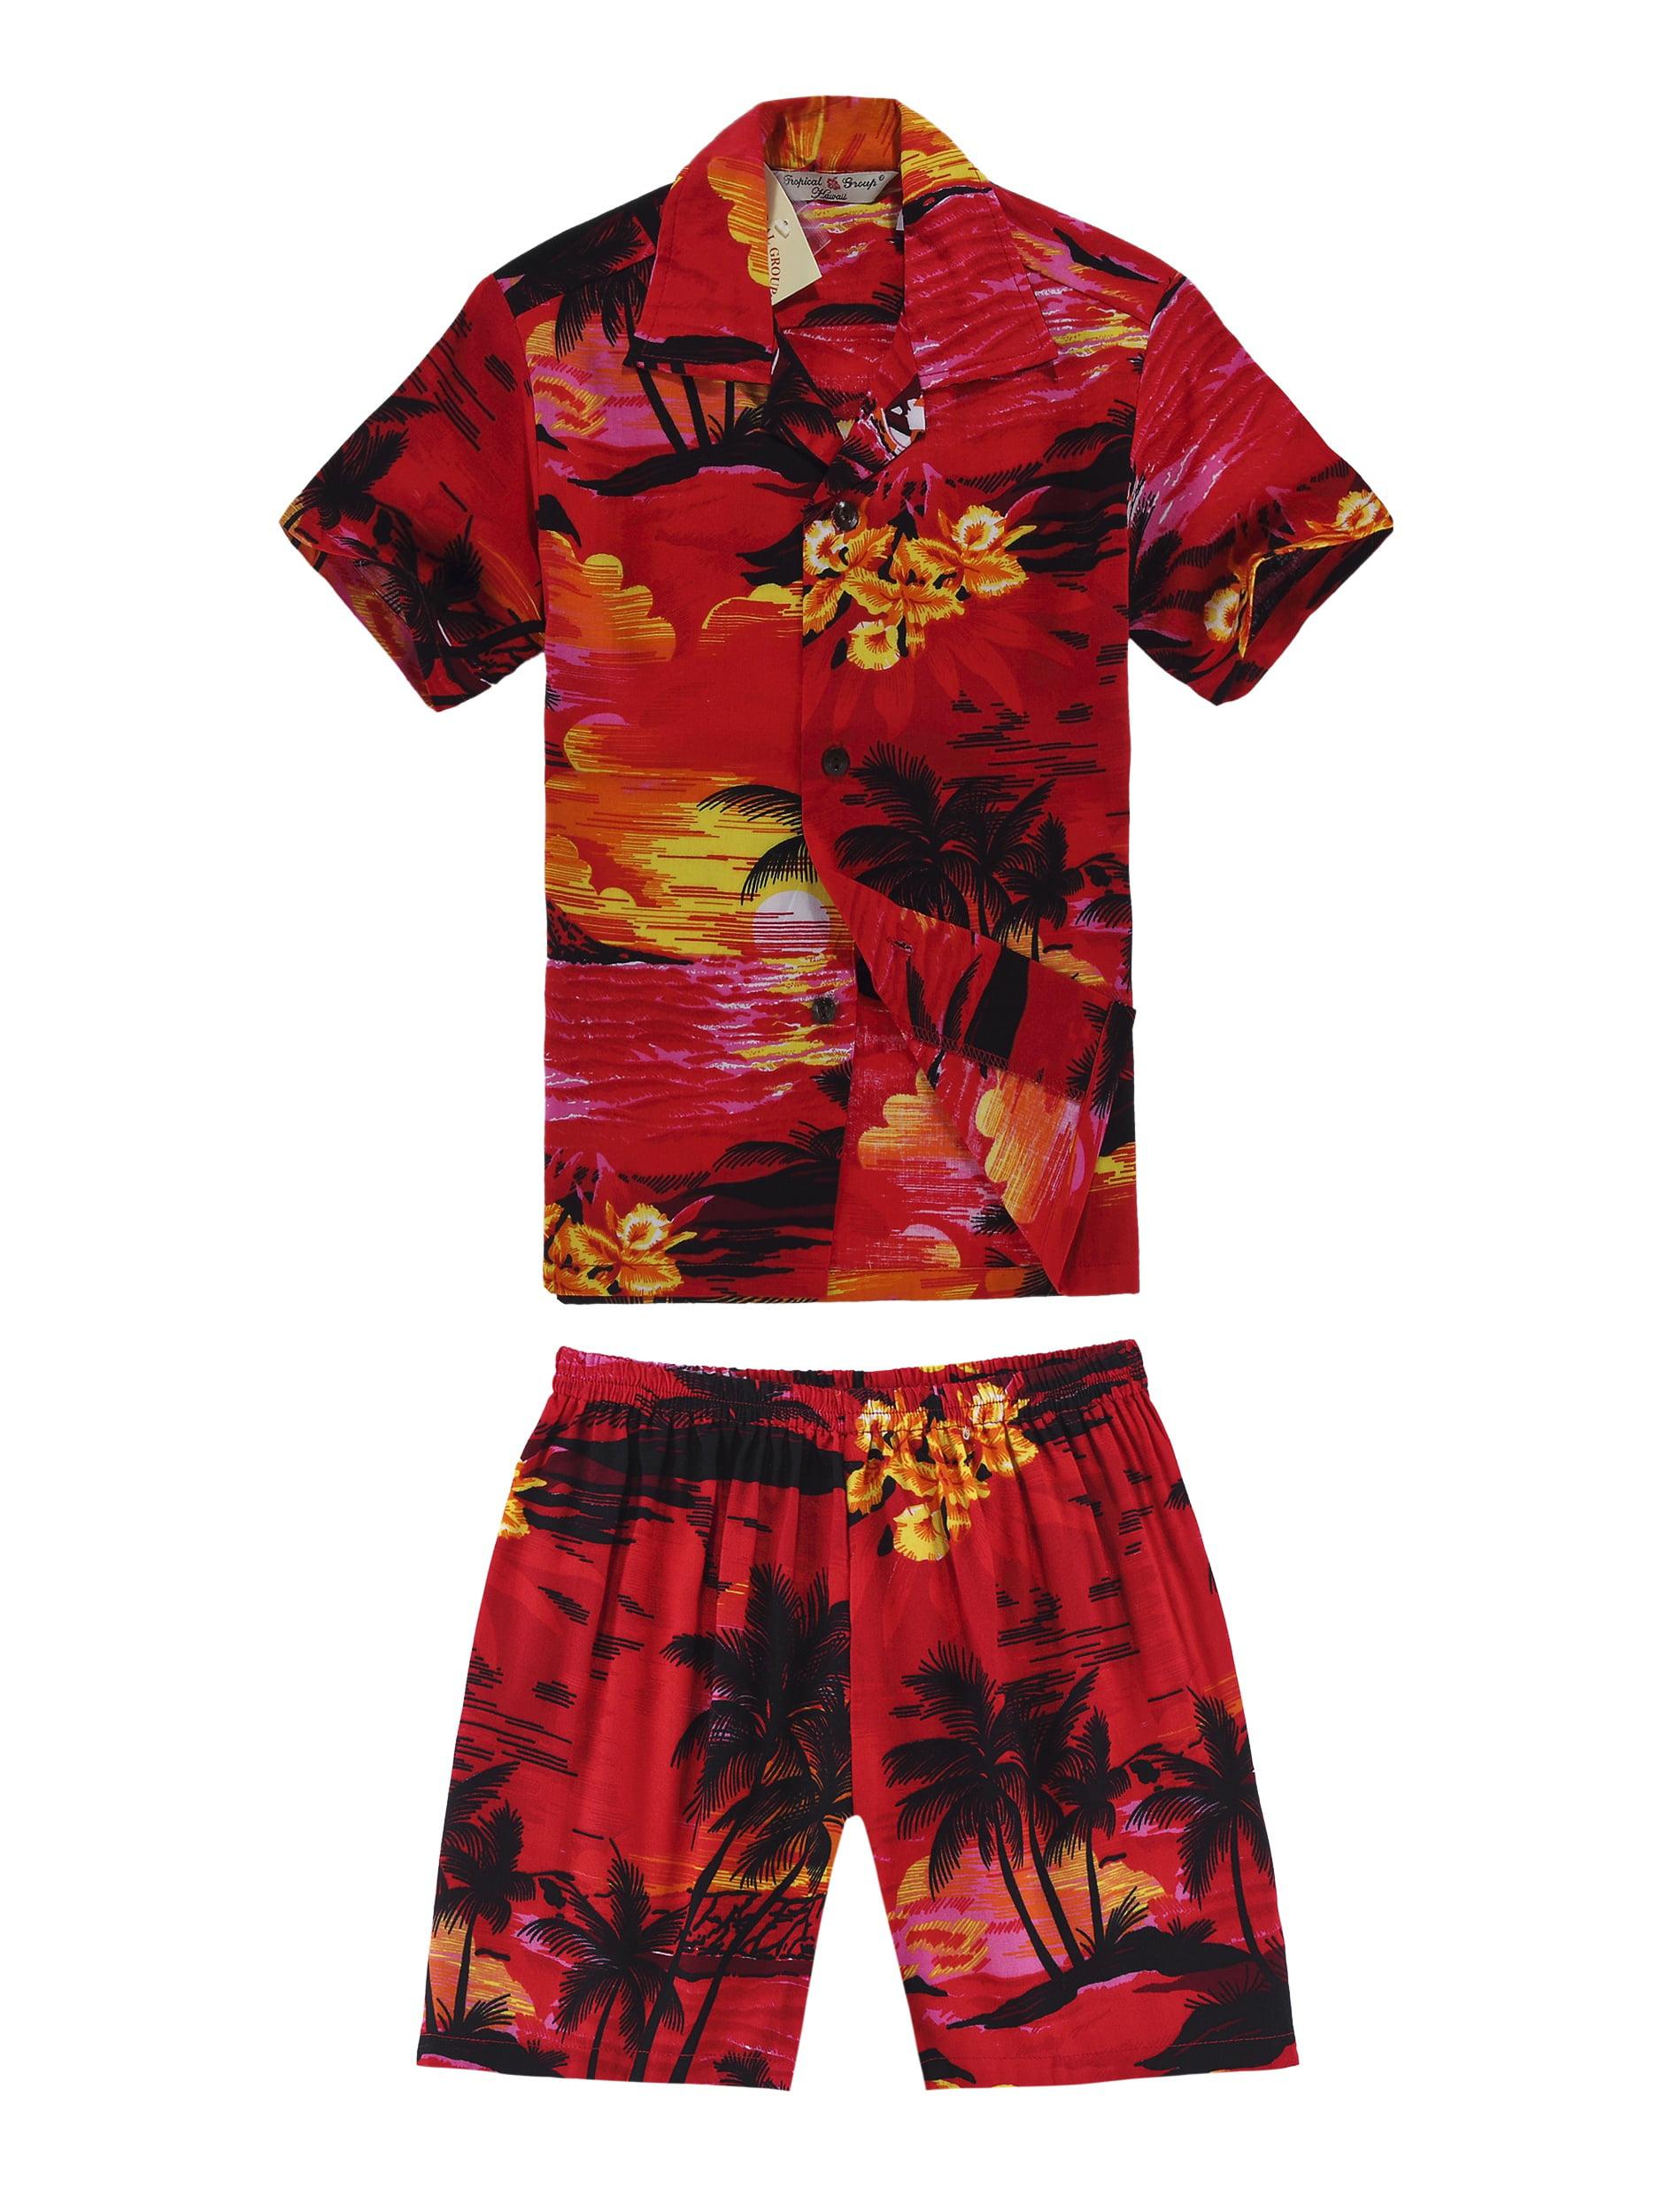 Boy Hawaiian Shirt and Shorts Cabana Set in Red Sunset Size 4